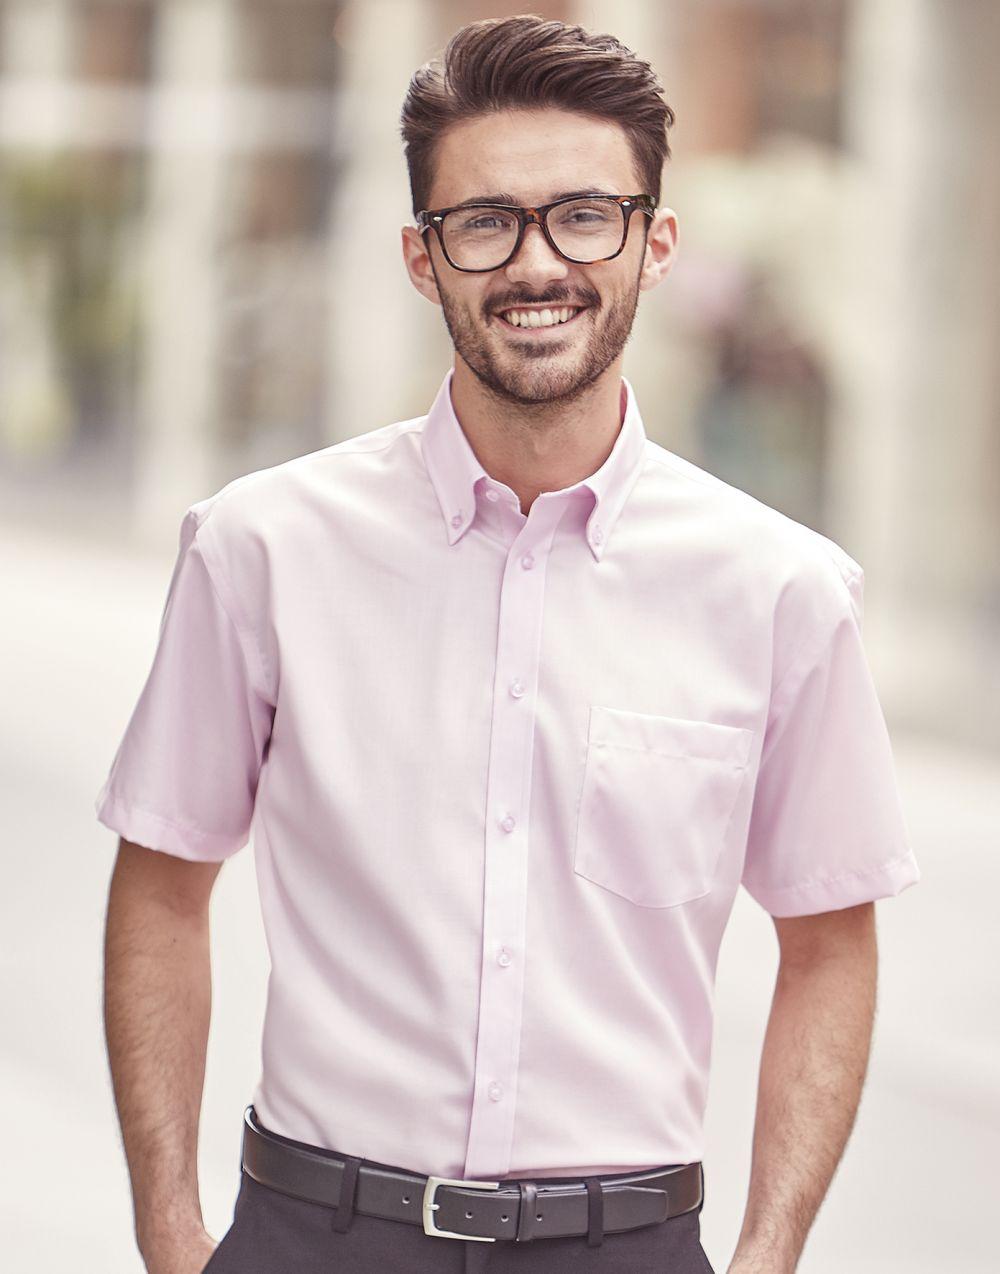 Camisas manga corta russell ultimate hombre para personalizar imagen 2